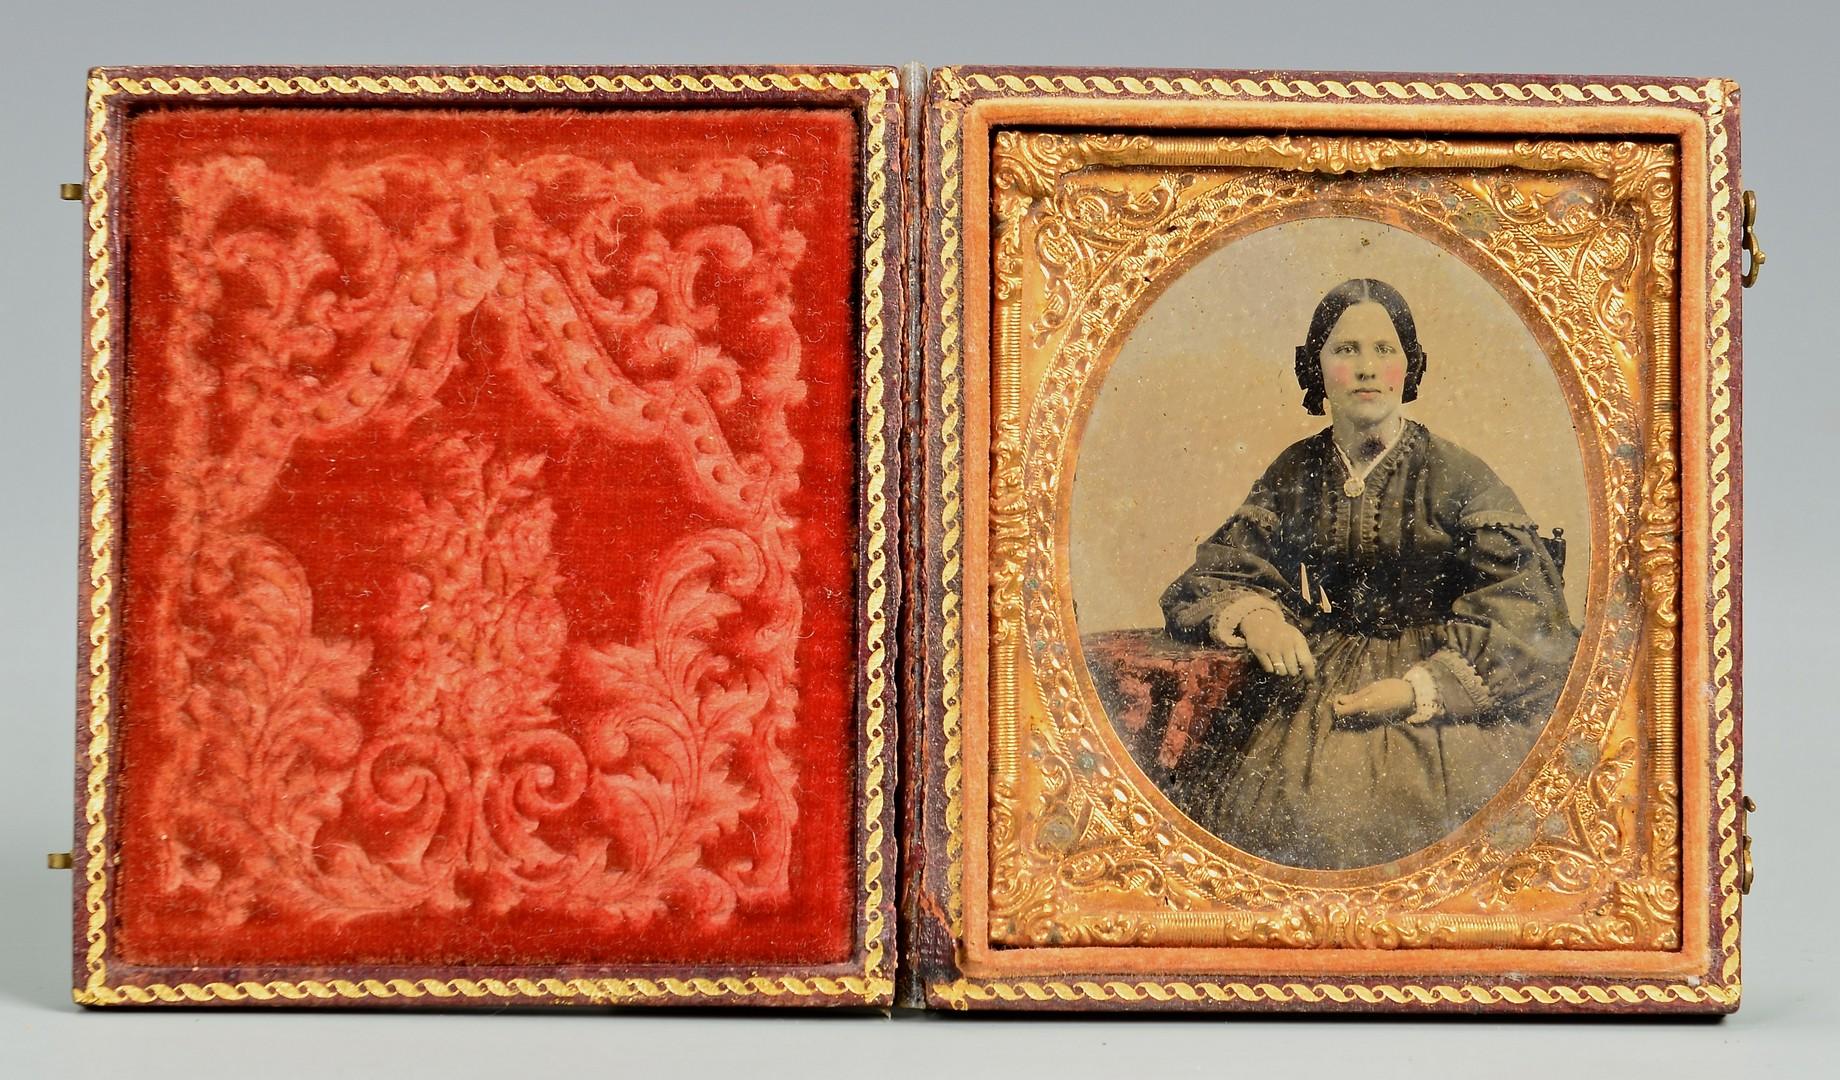 Lot 546: 3 Early Civil War Era Images